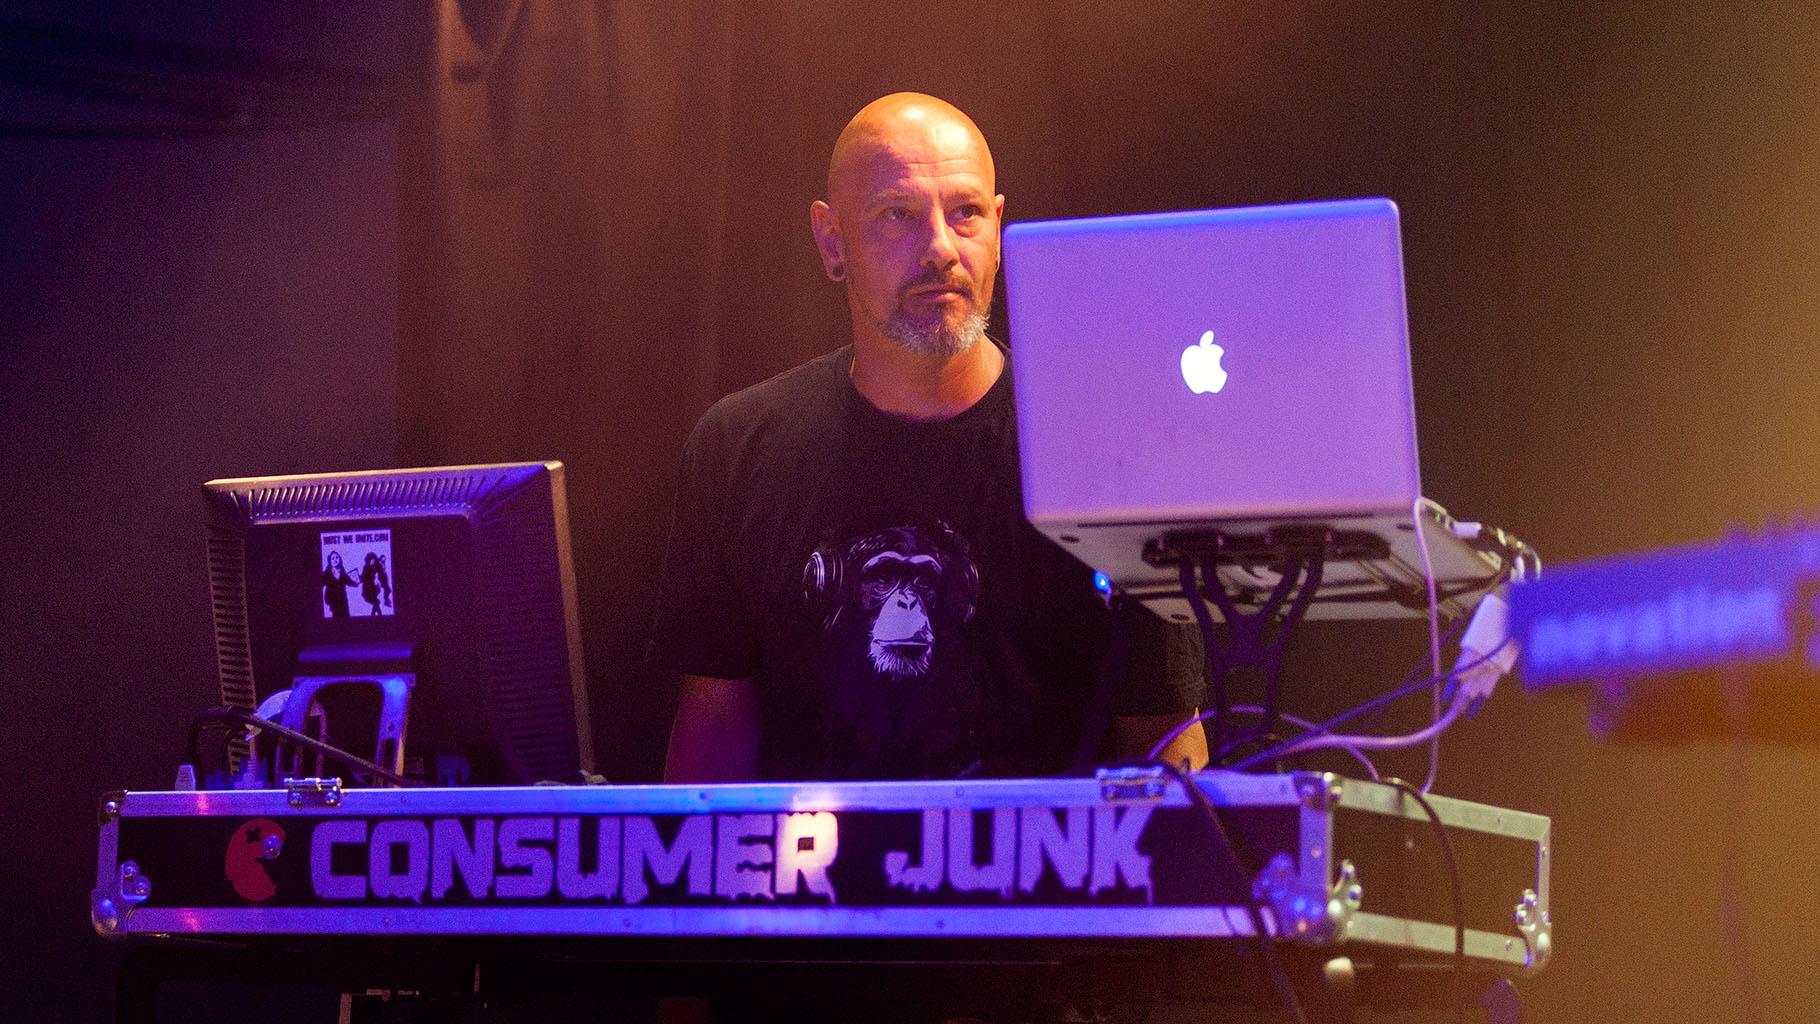 Consumer Junk 04